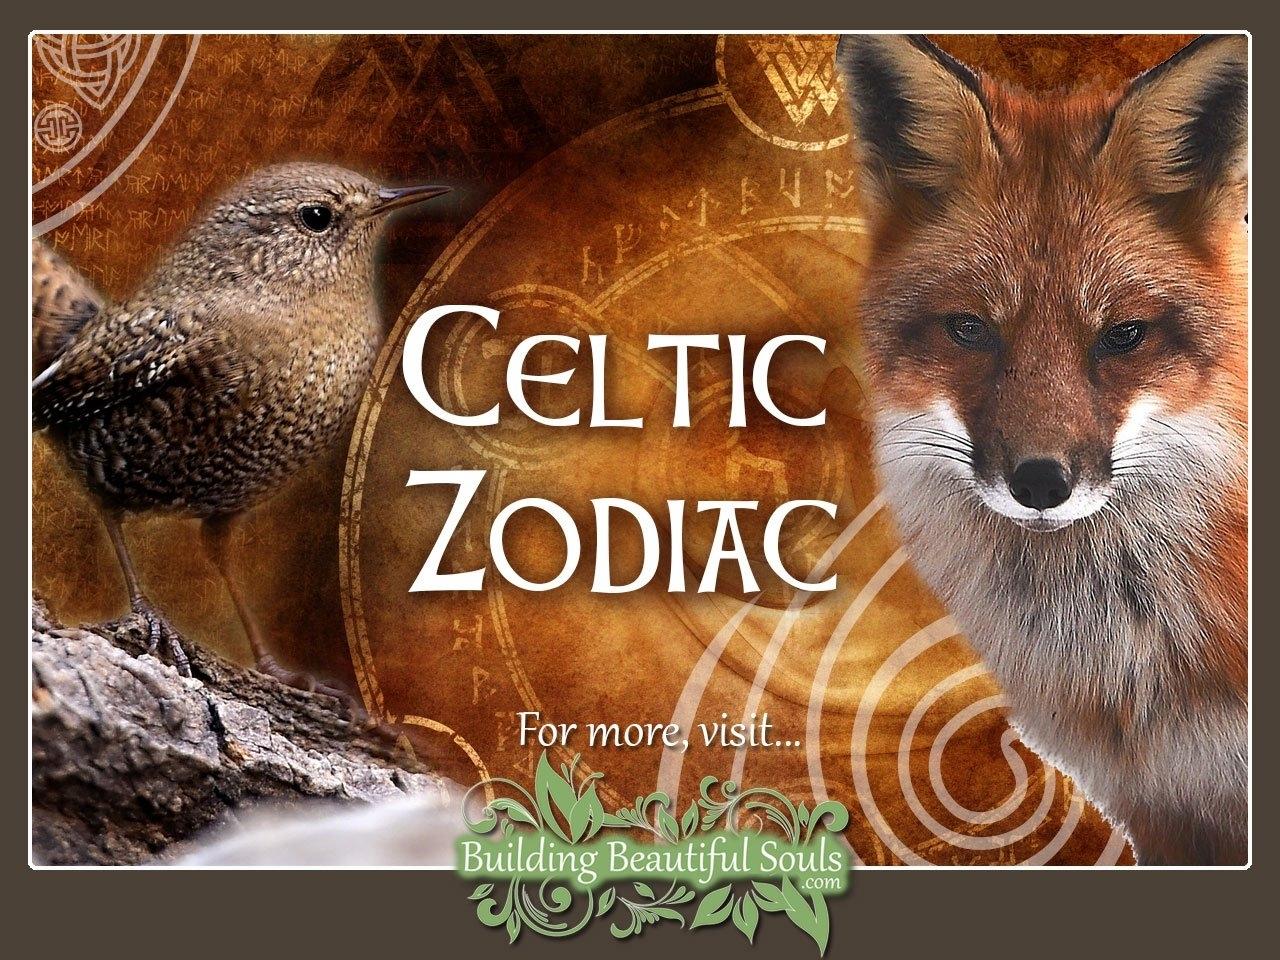 Celtic Zodiac Signs & Astrology | Celtic Animal Zodiac Meanings